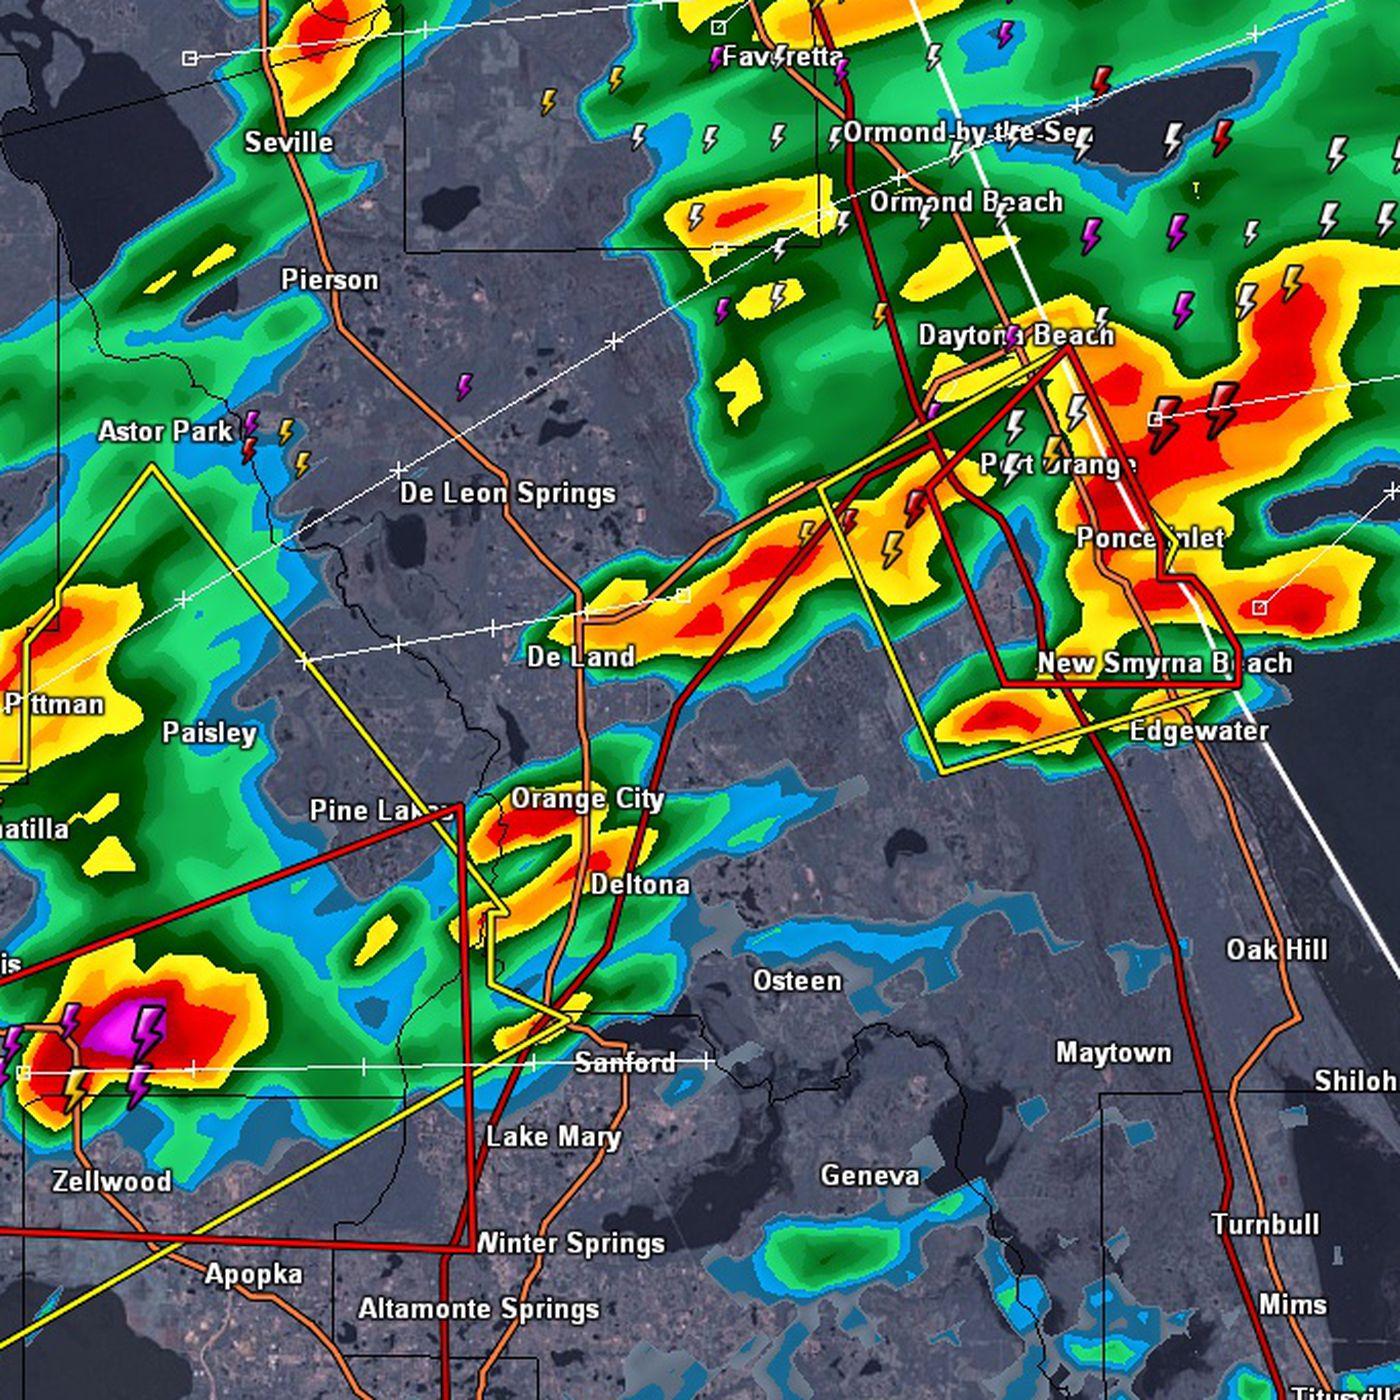 Daytona Speedway Weather Map.Nascar 2014 Daytona 500 Weather Severe Storms Causing Delay